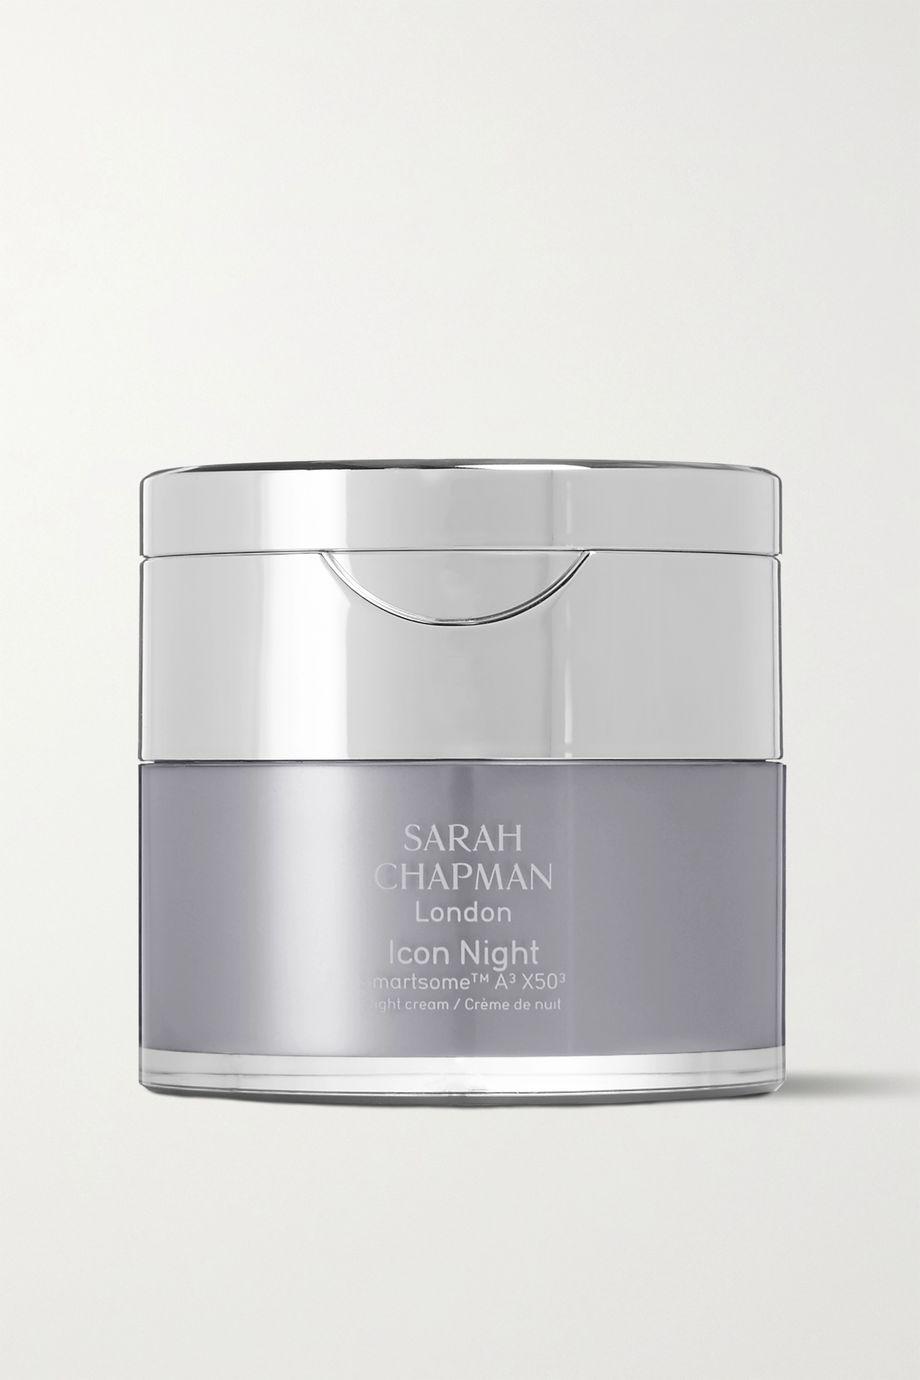 Sarah Chapman Icon Night Smartsome A³  X50³ Night Cream, 30ml